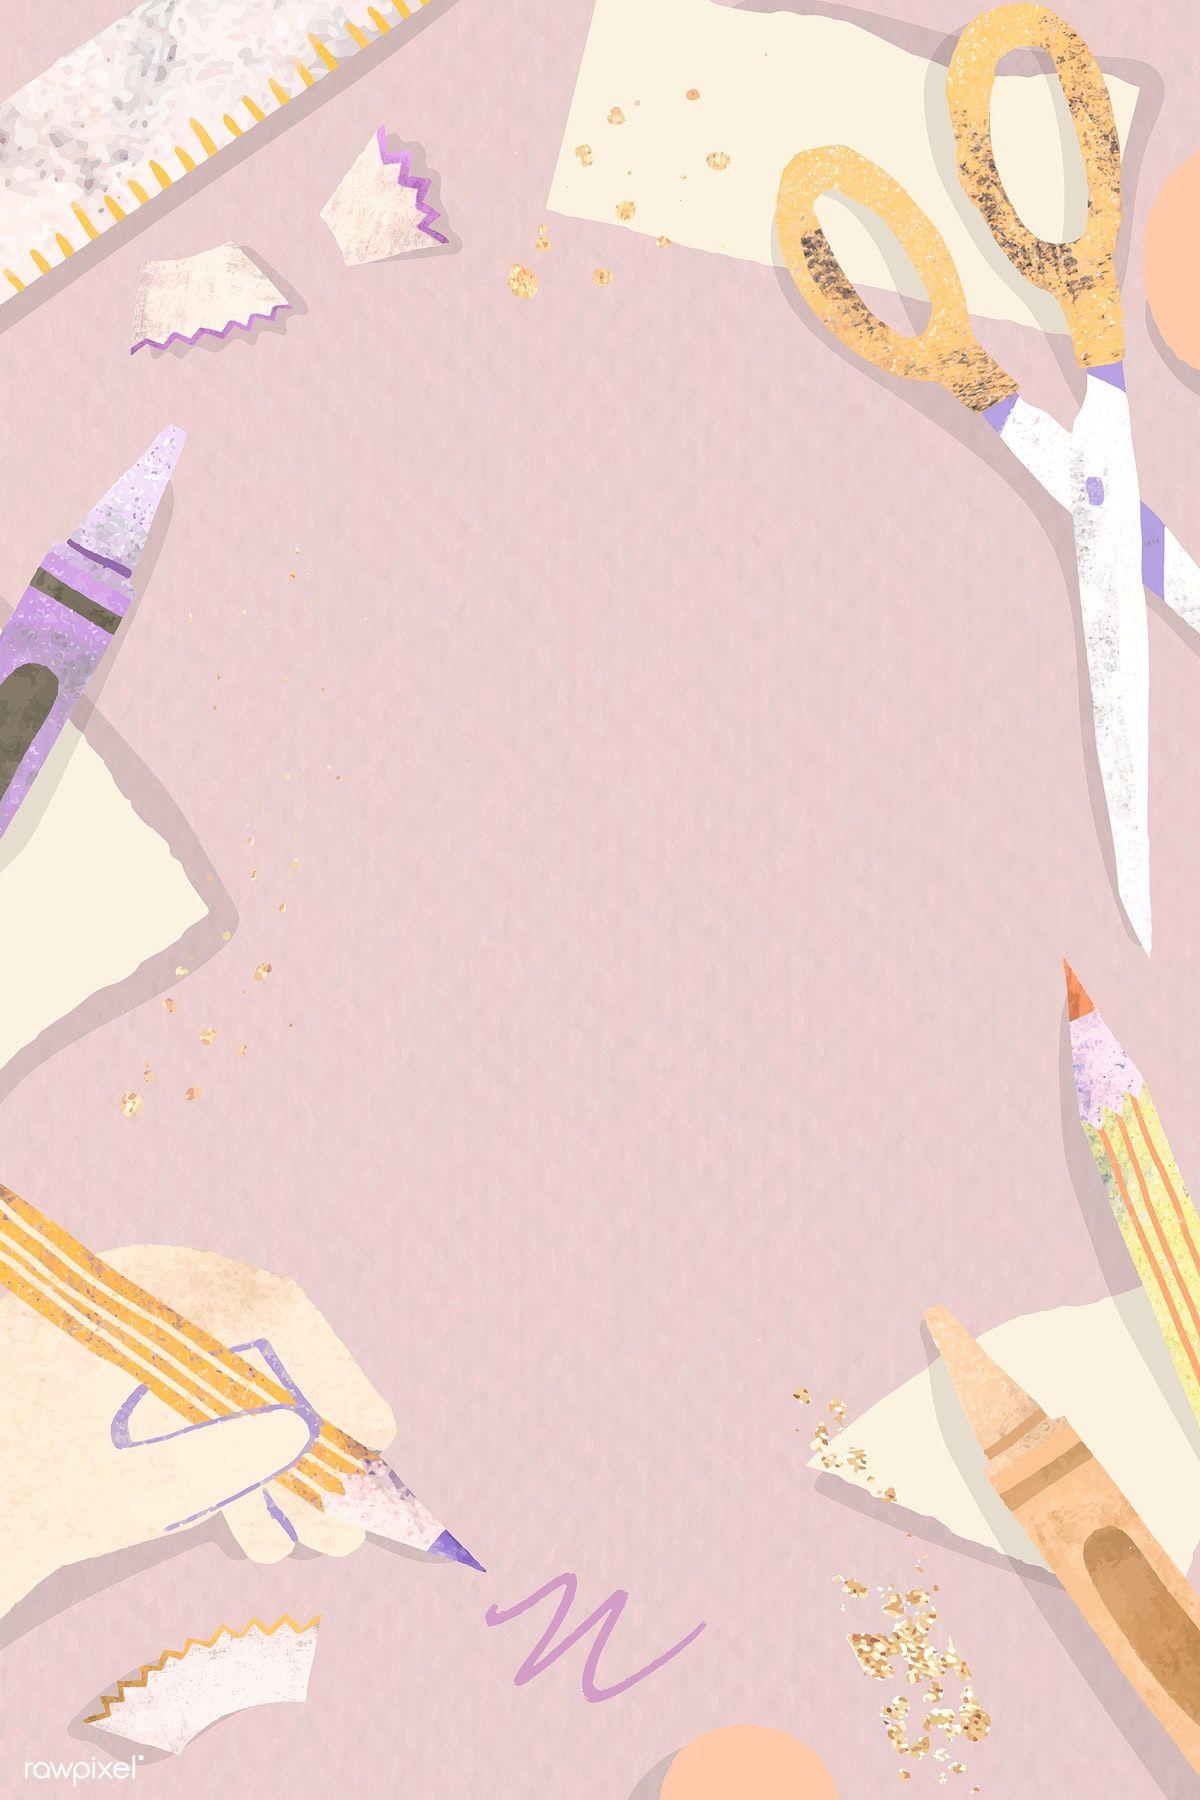 Download Premium Vector Of Blank Pink Back To School Vector 1224959 Powerpoint Background Design Poster Background Design School Illustration